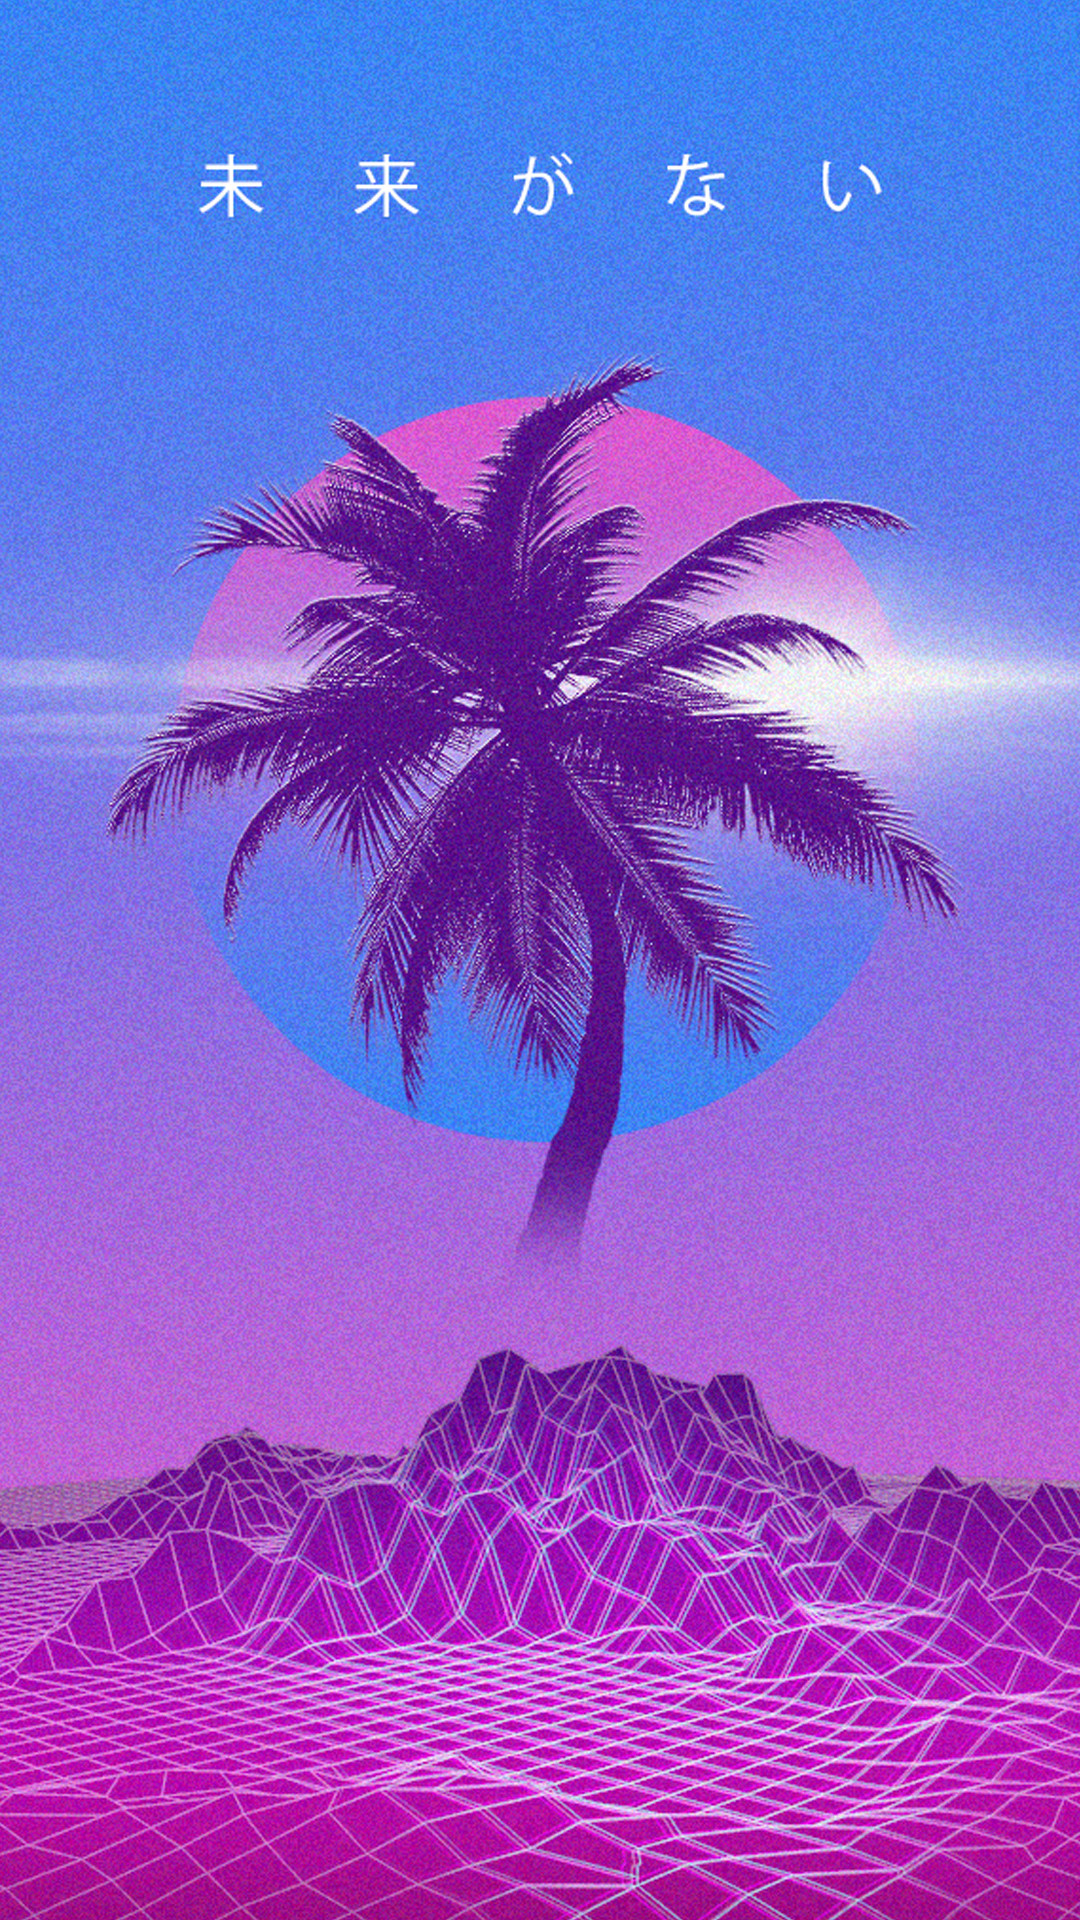 Retro 80s Wallpaper (66+ images)